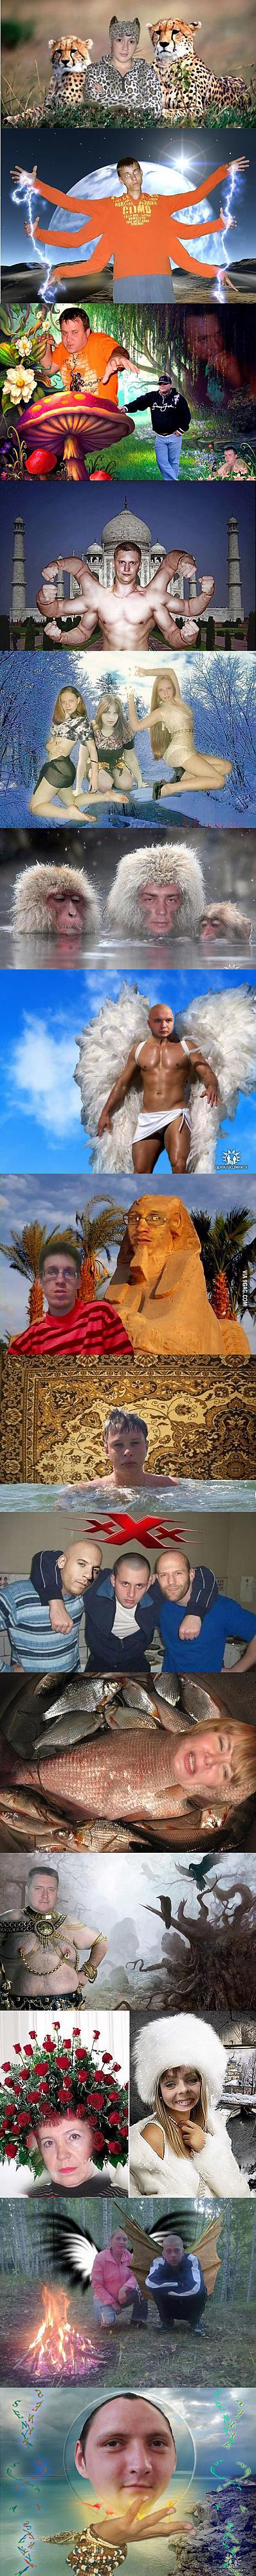 Autors: XHILL Photoshop Kings